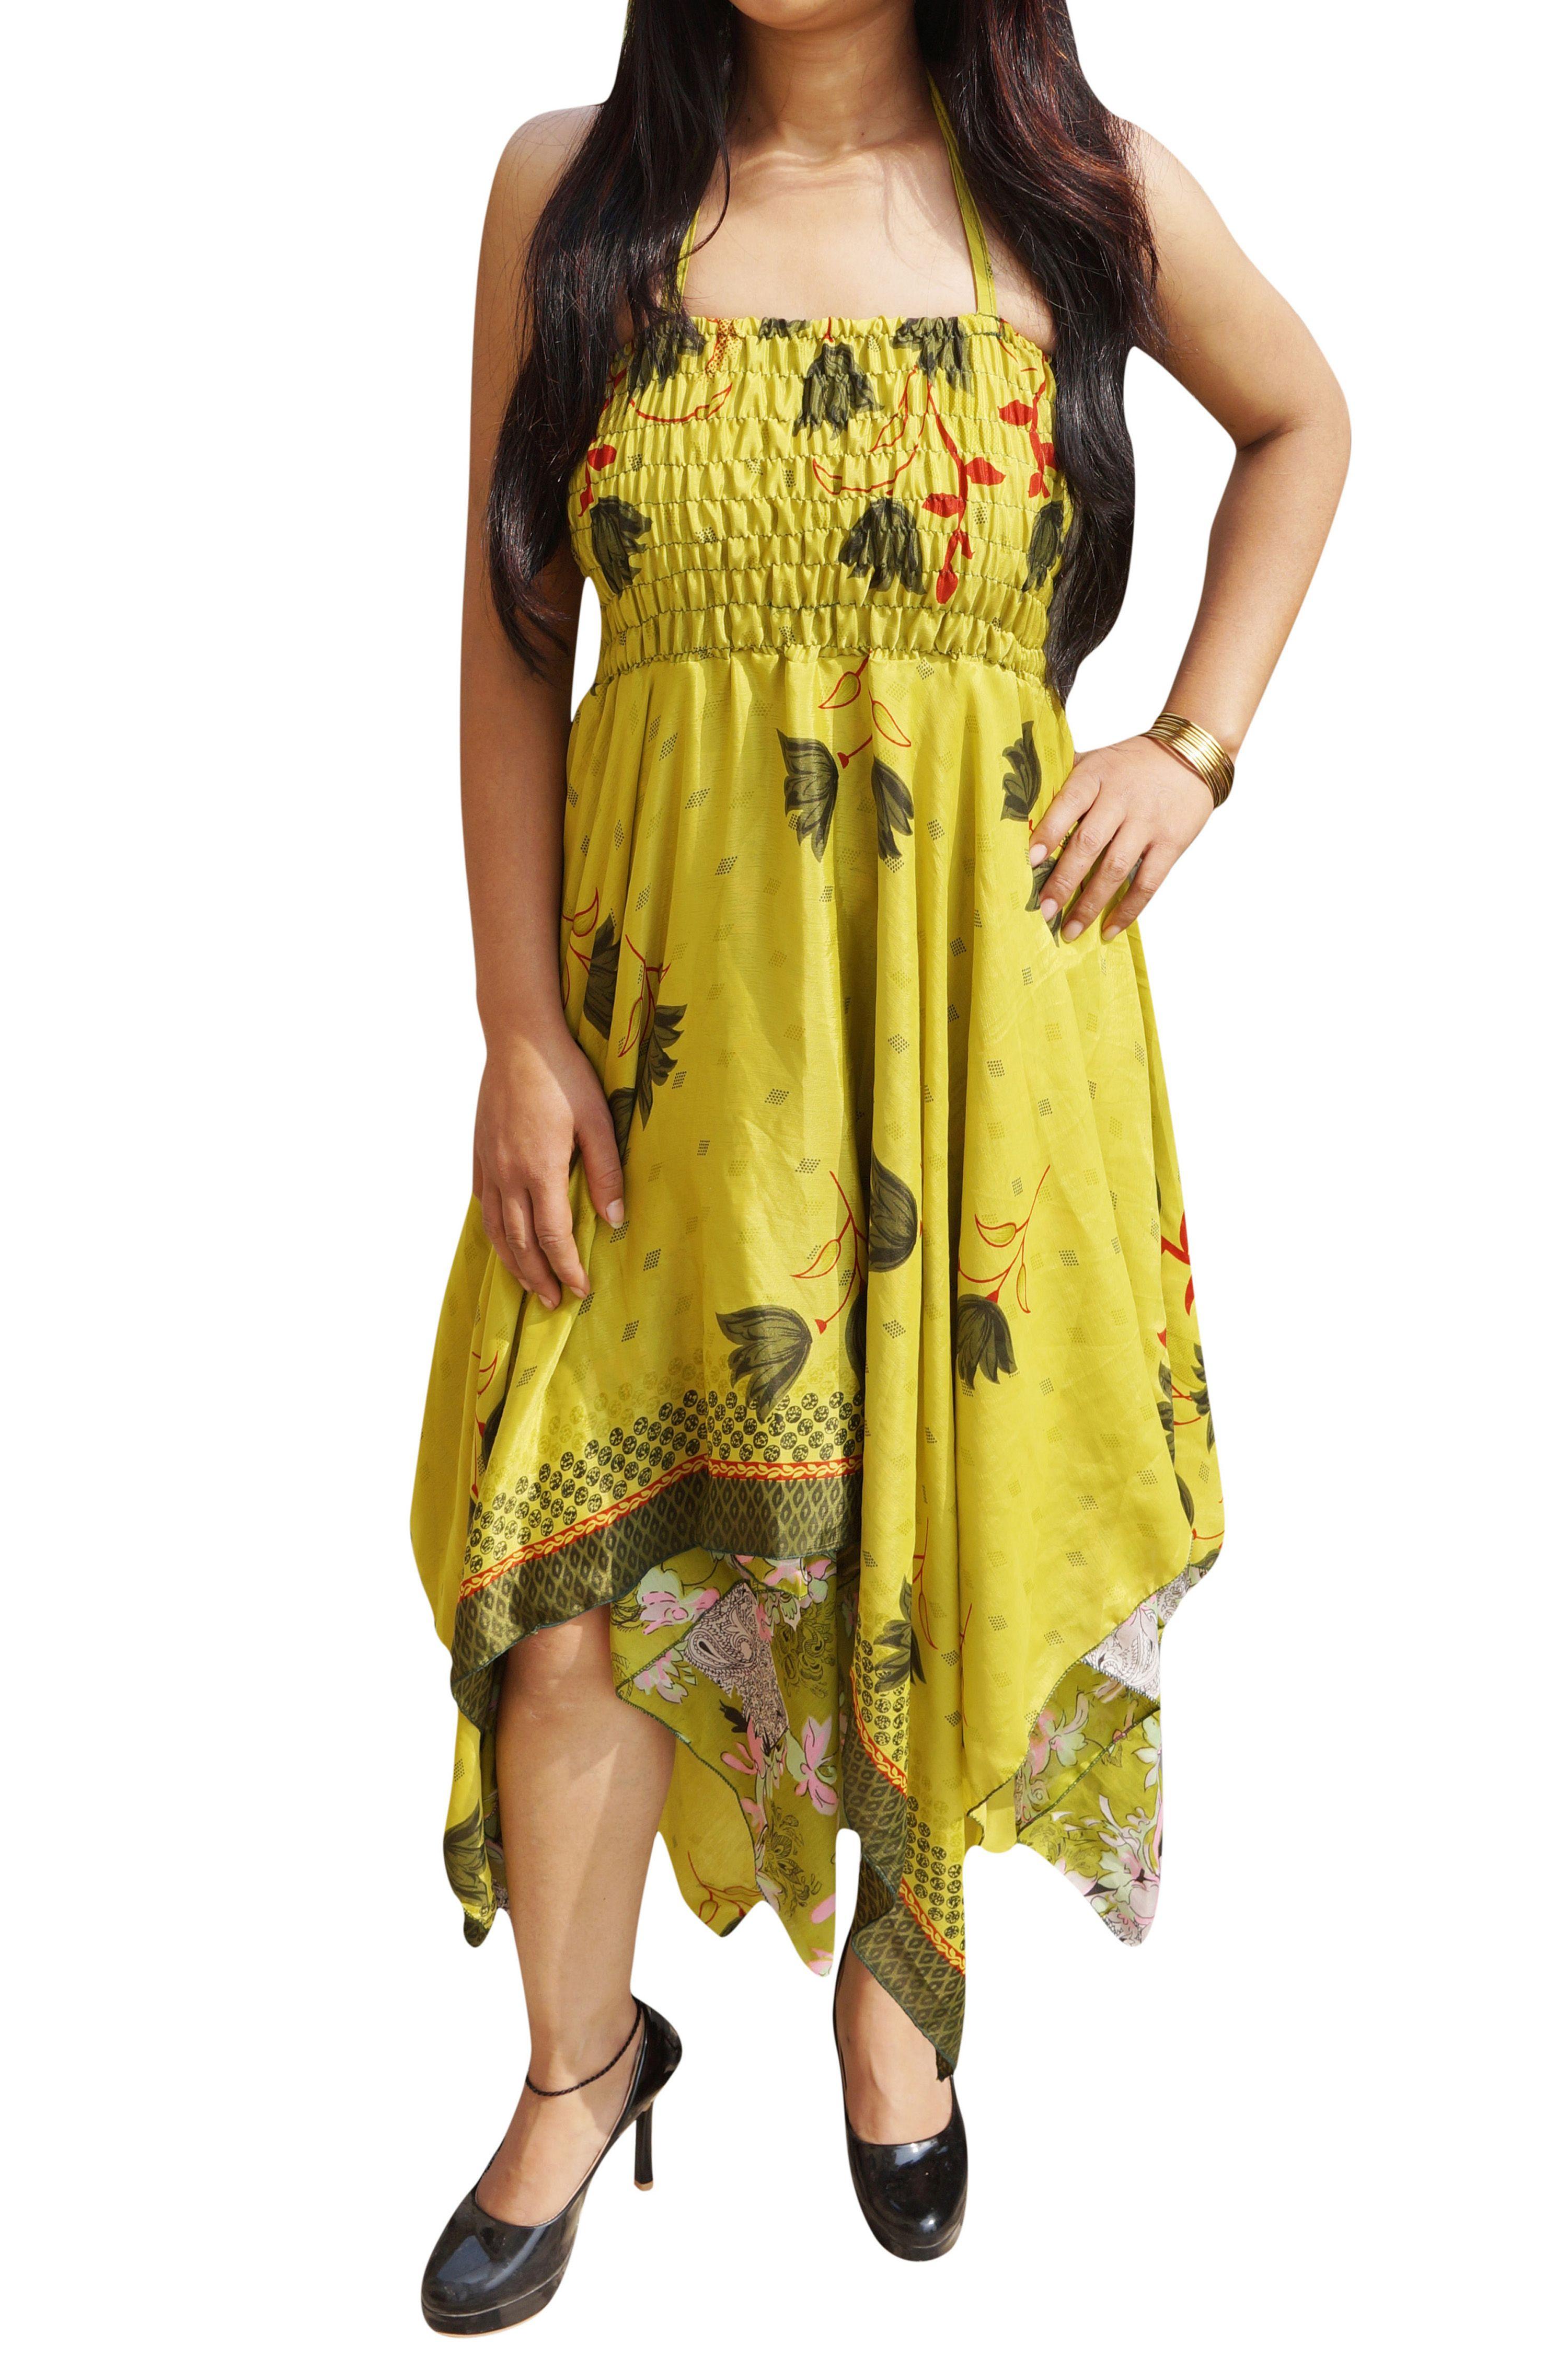 8a075d7306 Mogul Interior - Mogul Womens Halter Dress Handkerchief Hem Two Layer  Printed Gypsy Beach Summer Dresses